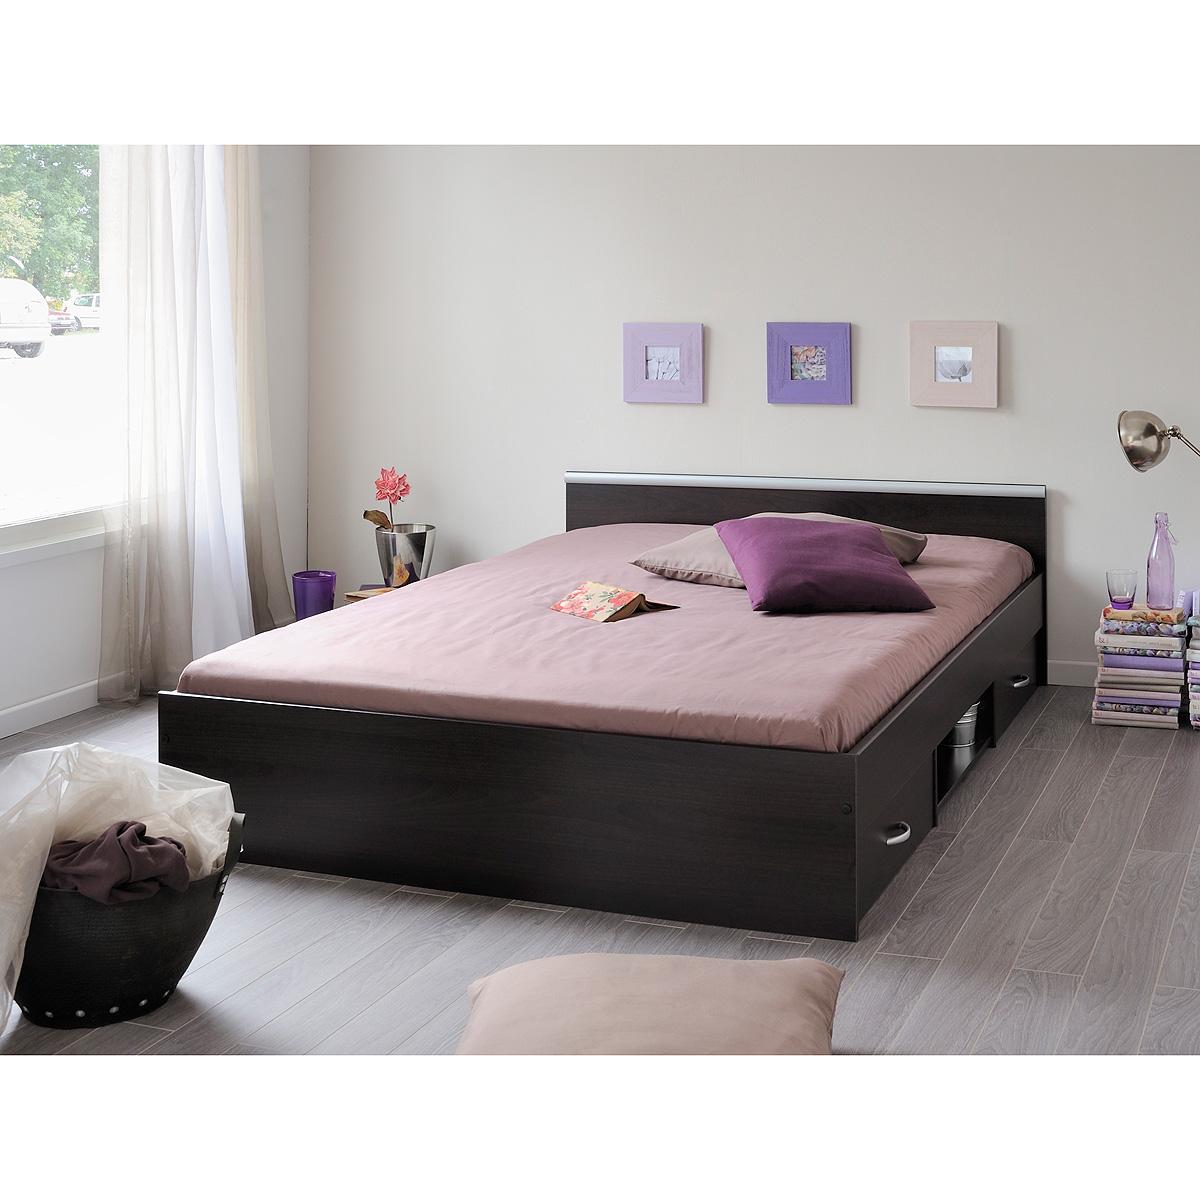 bett mega stauraumbett schlafzimmerbett kinderzimmerbett buche wei grau braun ebay. Black Bedroom Furniture Sets. Home Design Ideas